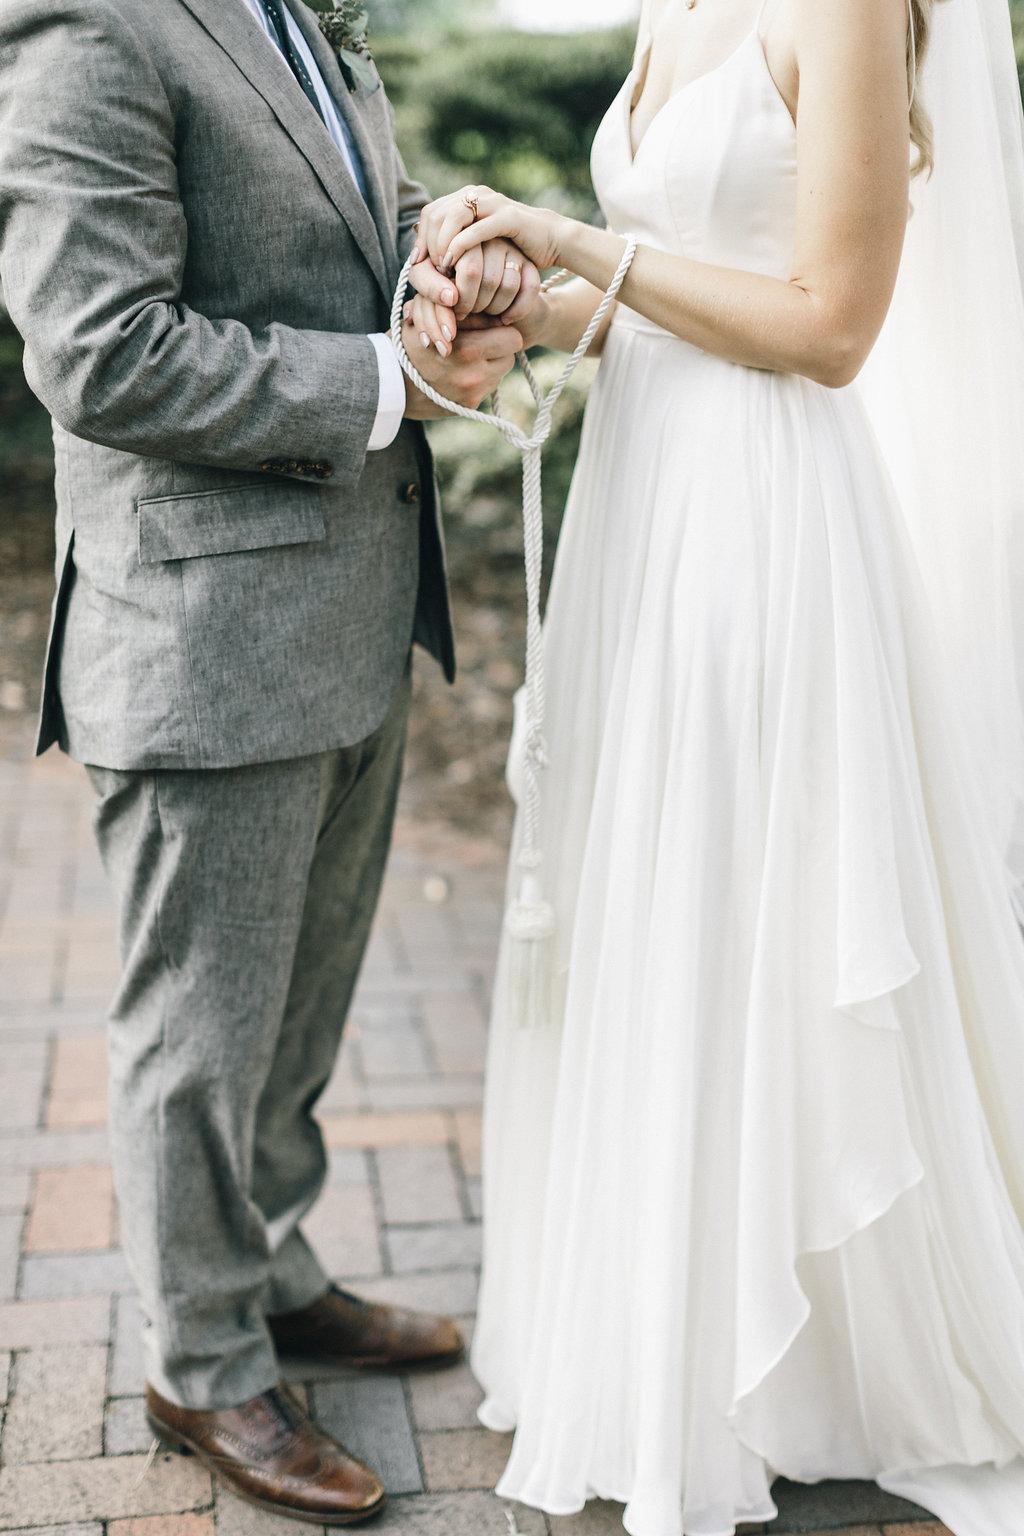 shannon-britt-mackensey-alexander-photography-green-wedding-shoes-ivory-and-beau-bridal-boutique-savannah-wedding-planner-savannah-bridal-boutique-savannah-wedding-dresses-savannah-florist-summer-solstice-wedding-boho-soho-south-cafe-wedding-35.jpg